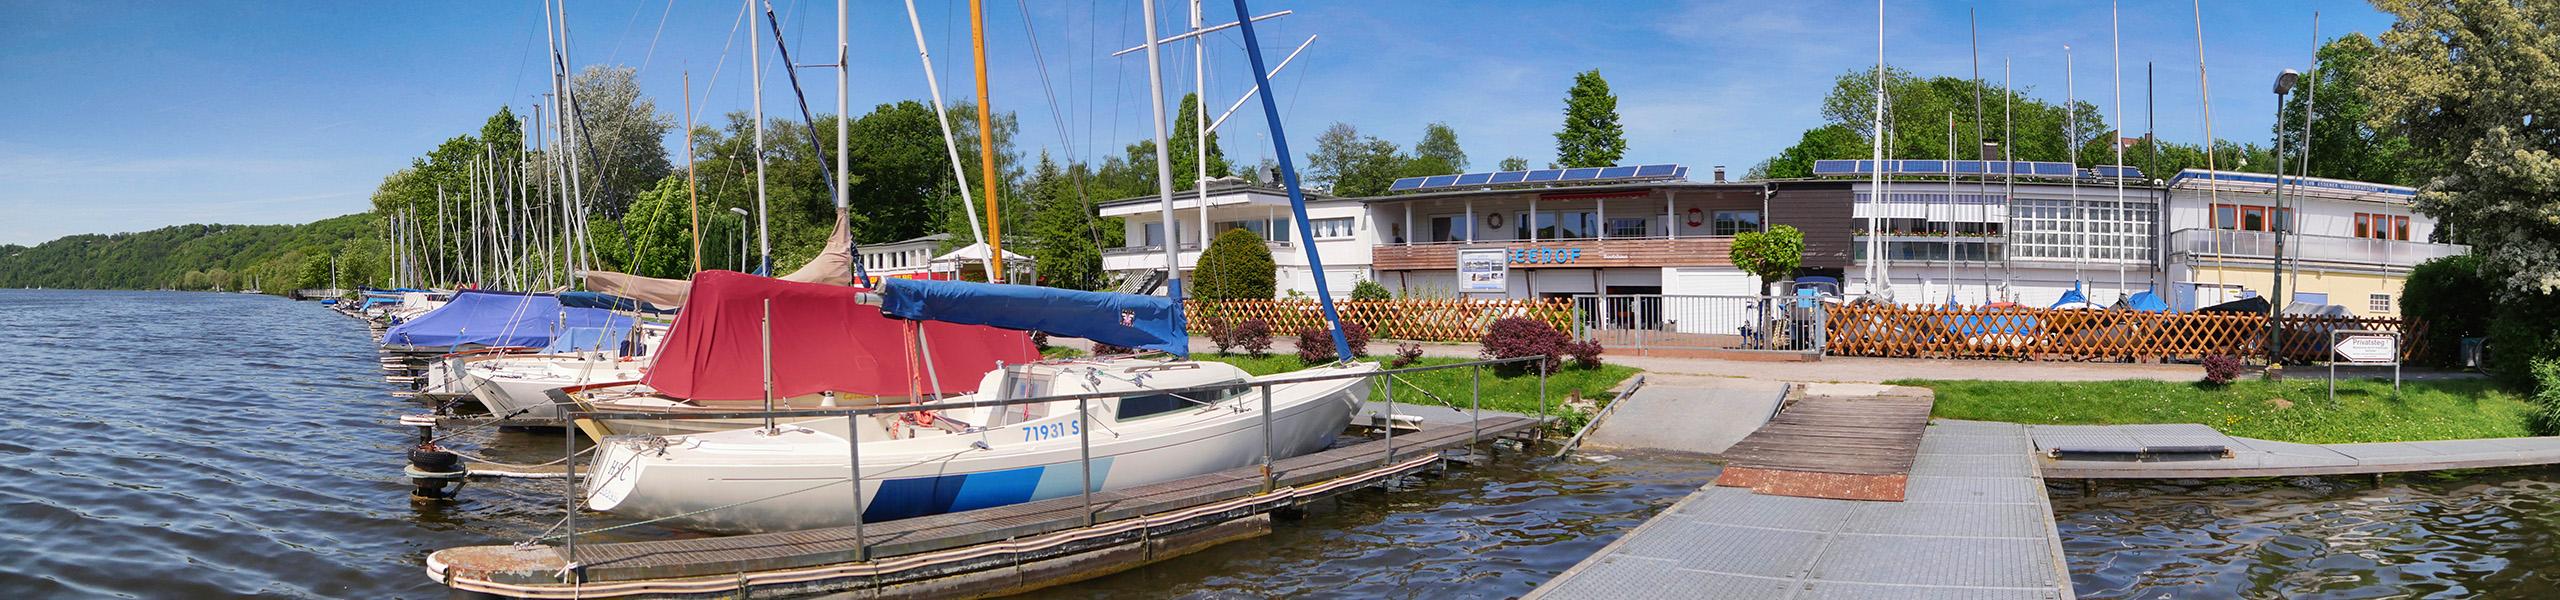 Das Bootshaus SEEHOF